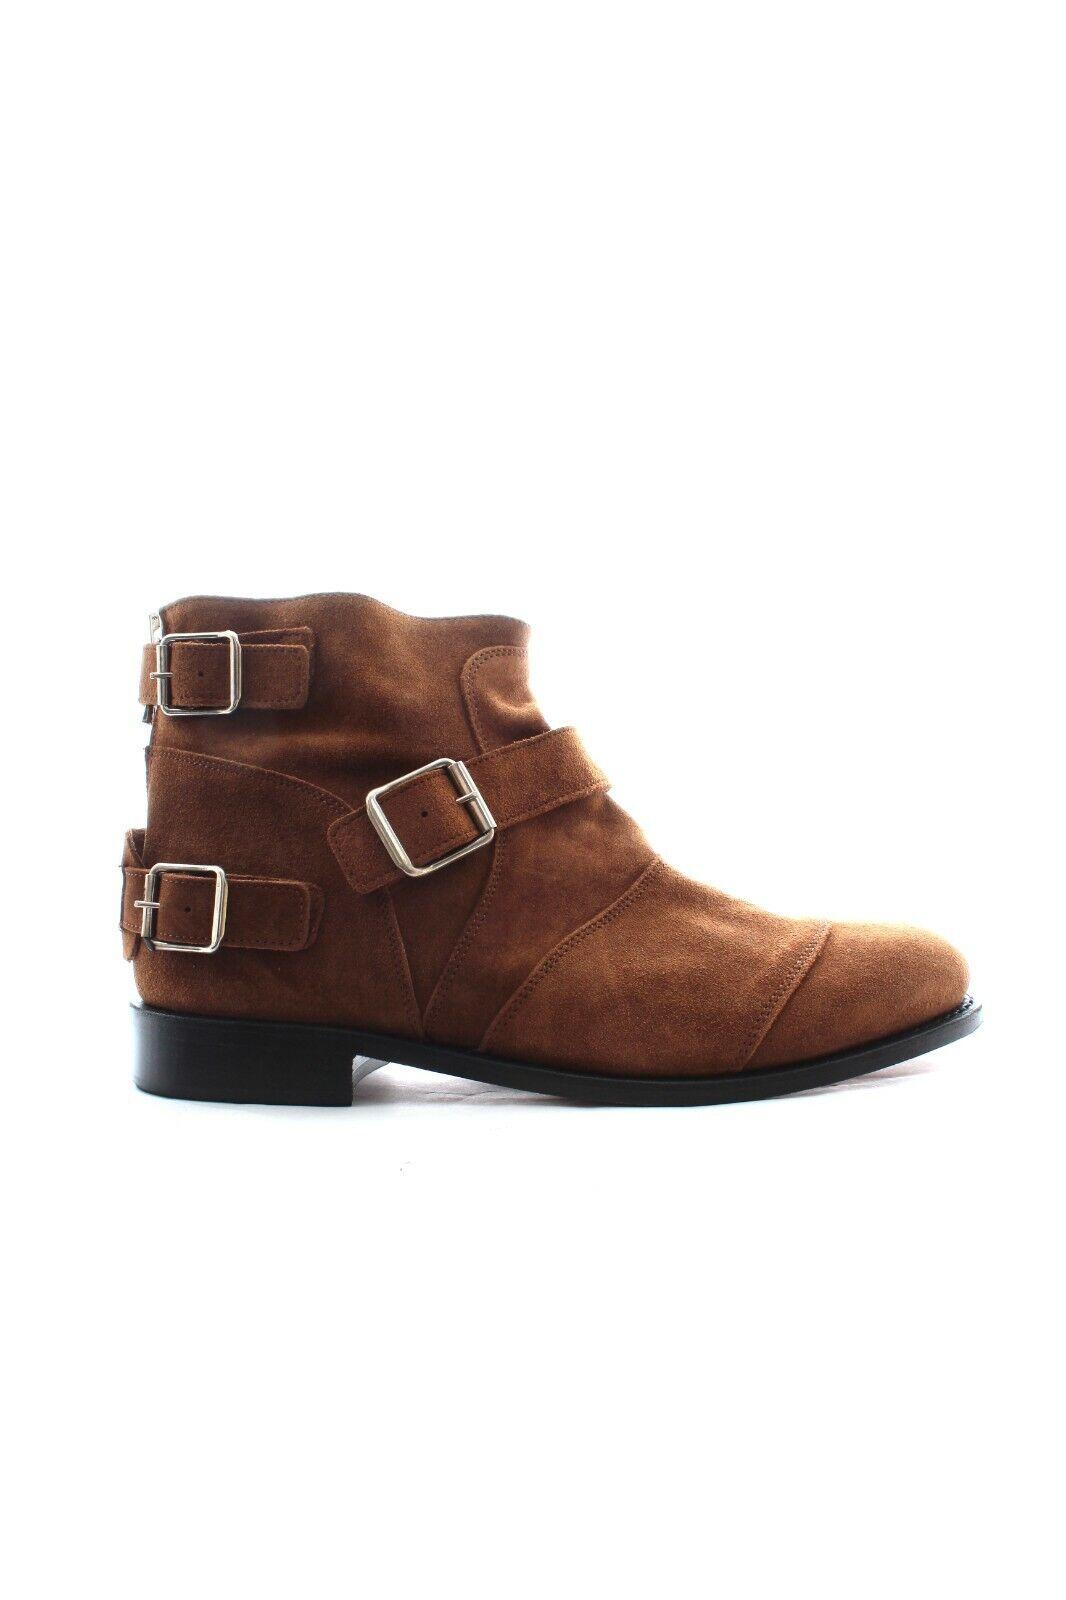 Balmain x H&M Suede Buckled Ankle Stiefel   braun